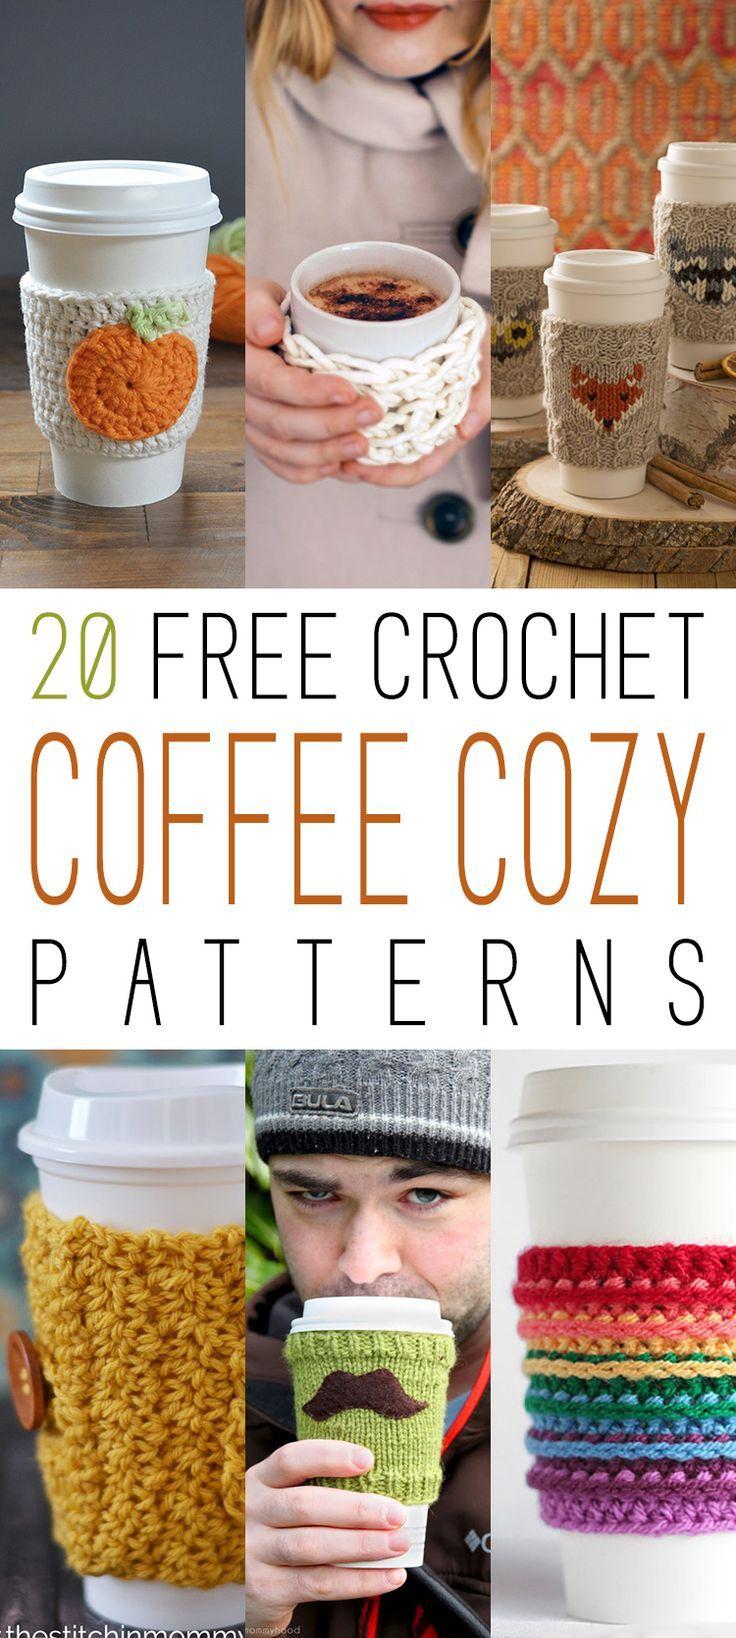 20 Free Crochet Coffee Cozy Patterns | Tejido, Taza termo y Vasos